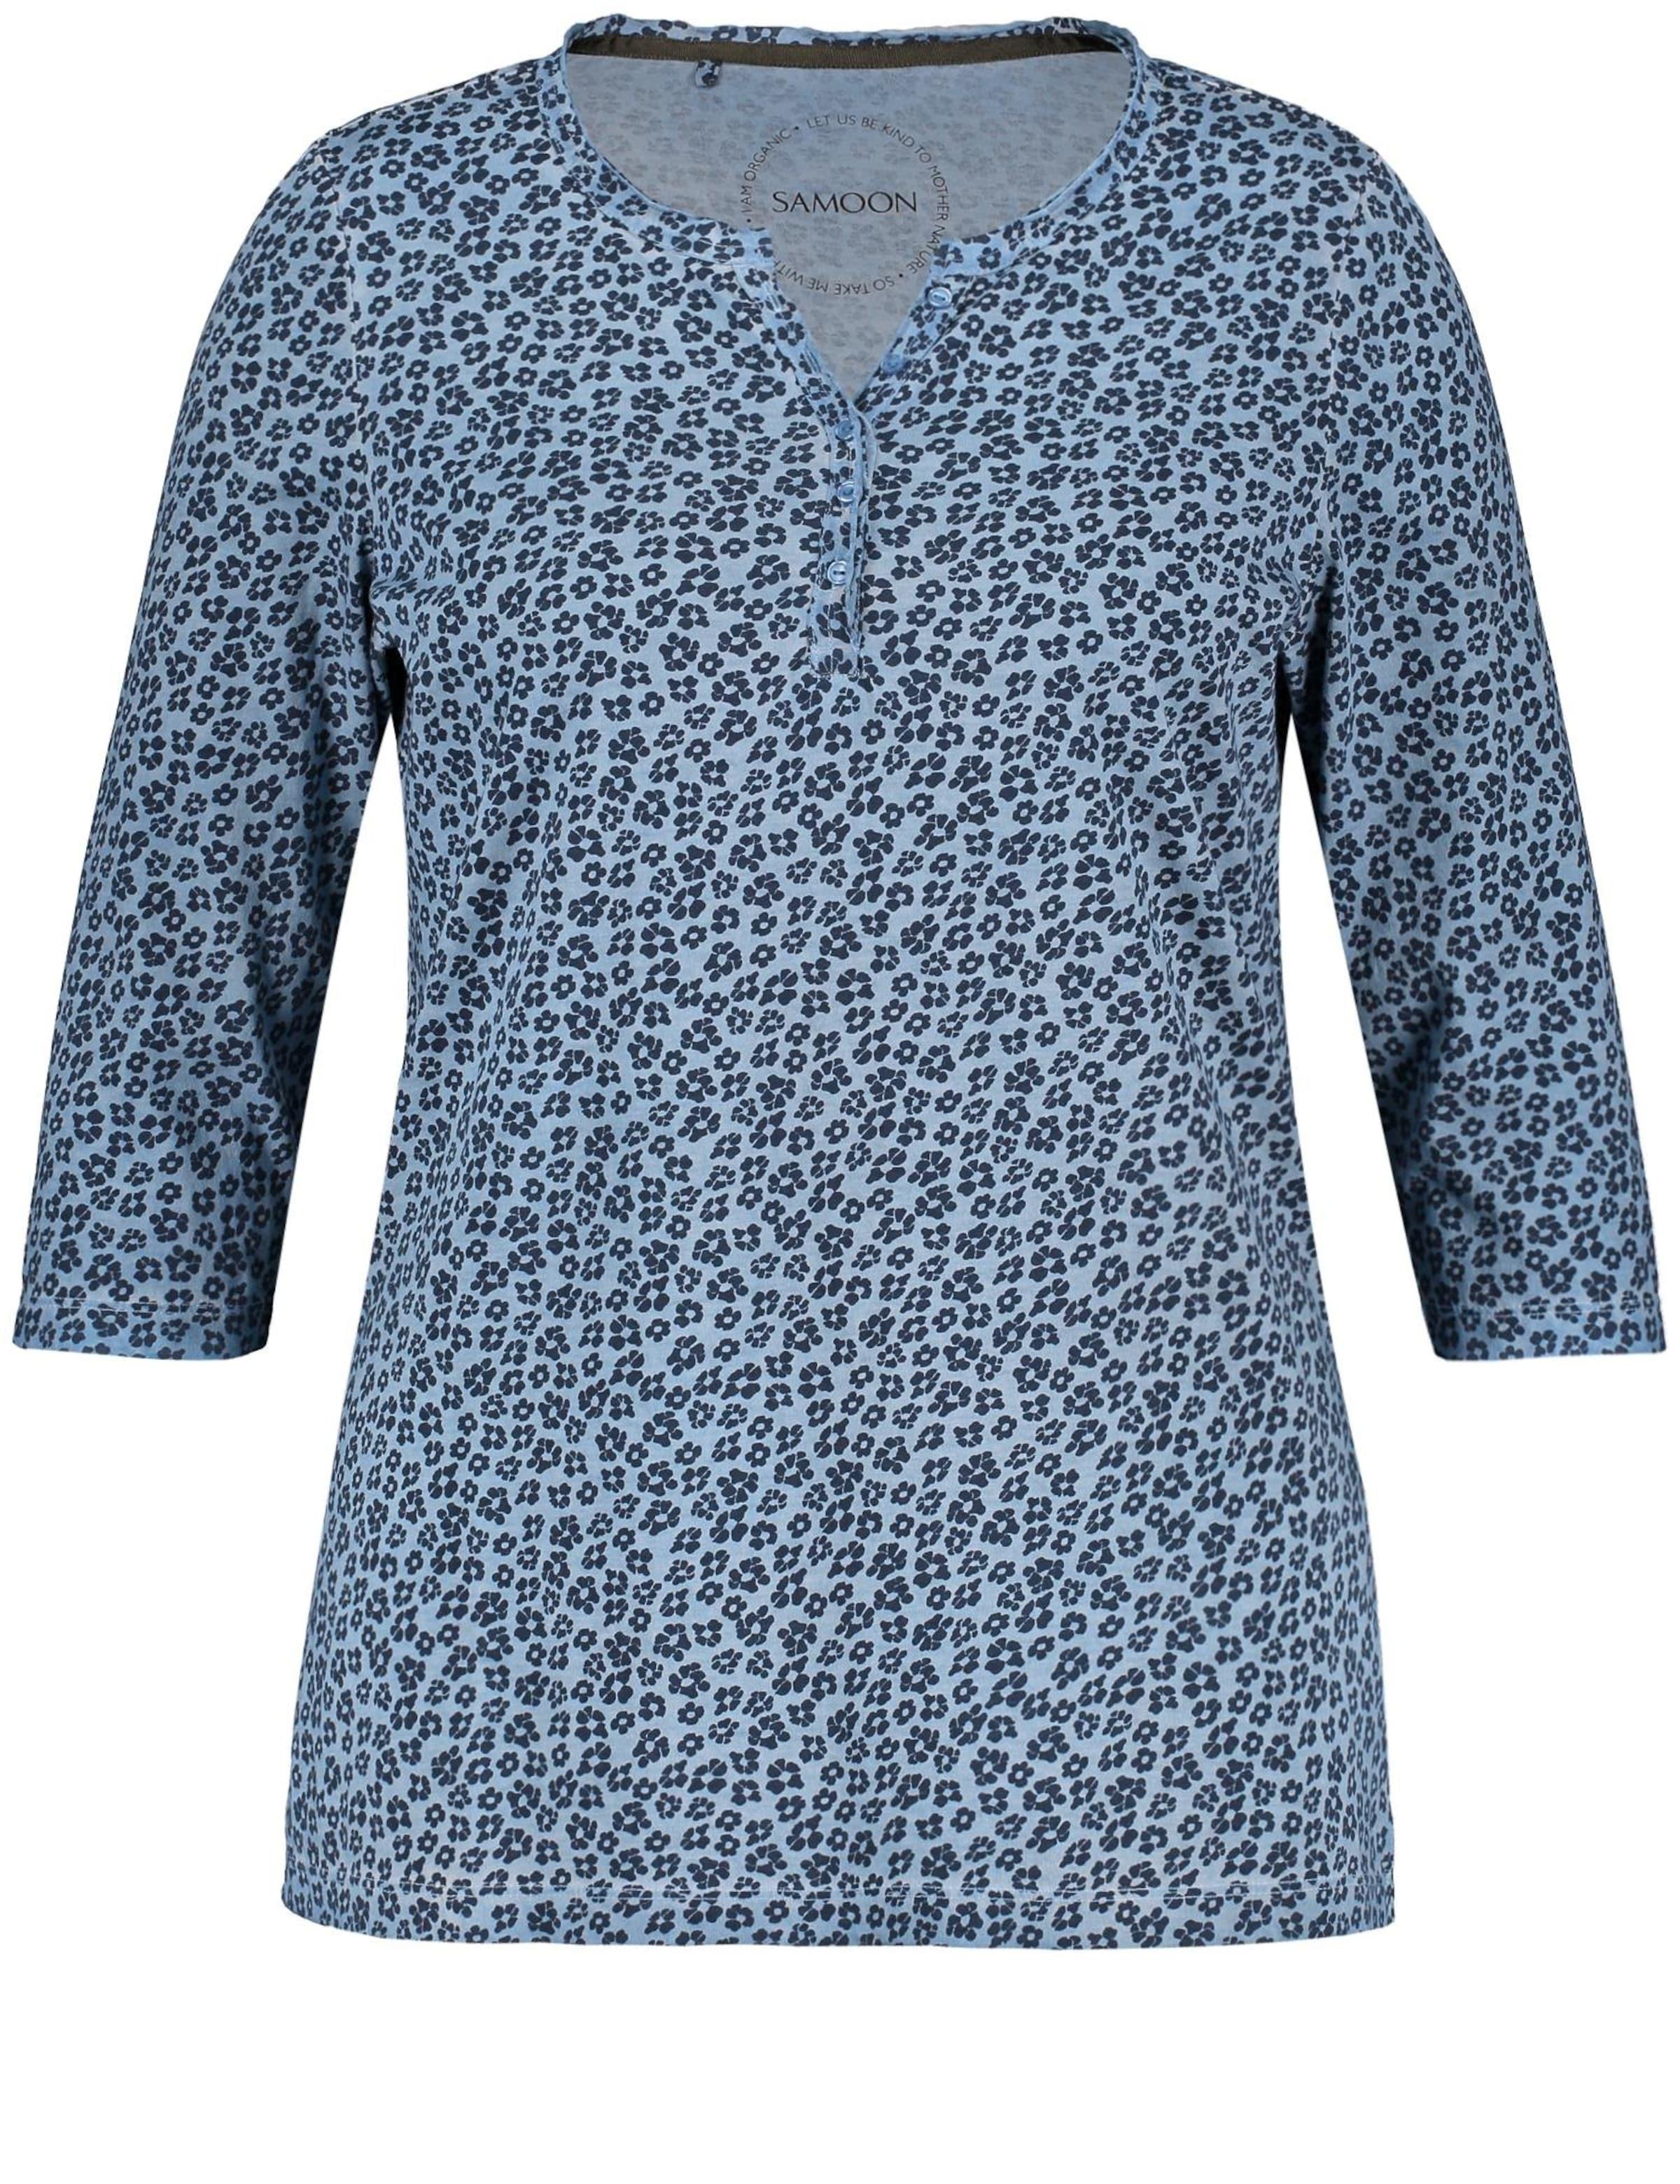 Samoon Shirt Samoon Blau In Blau Shirt In oedCBWrx